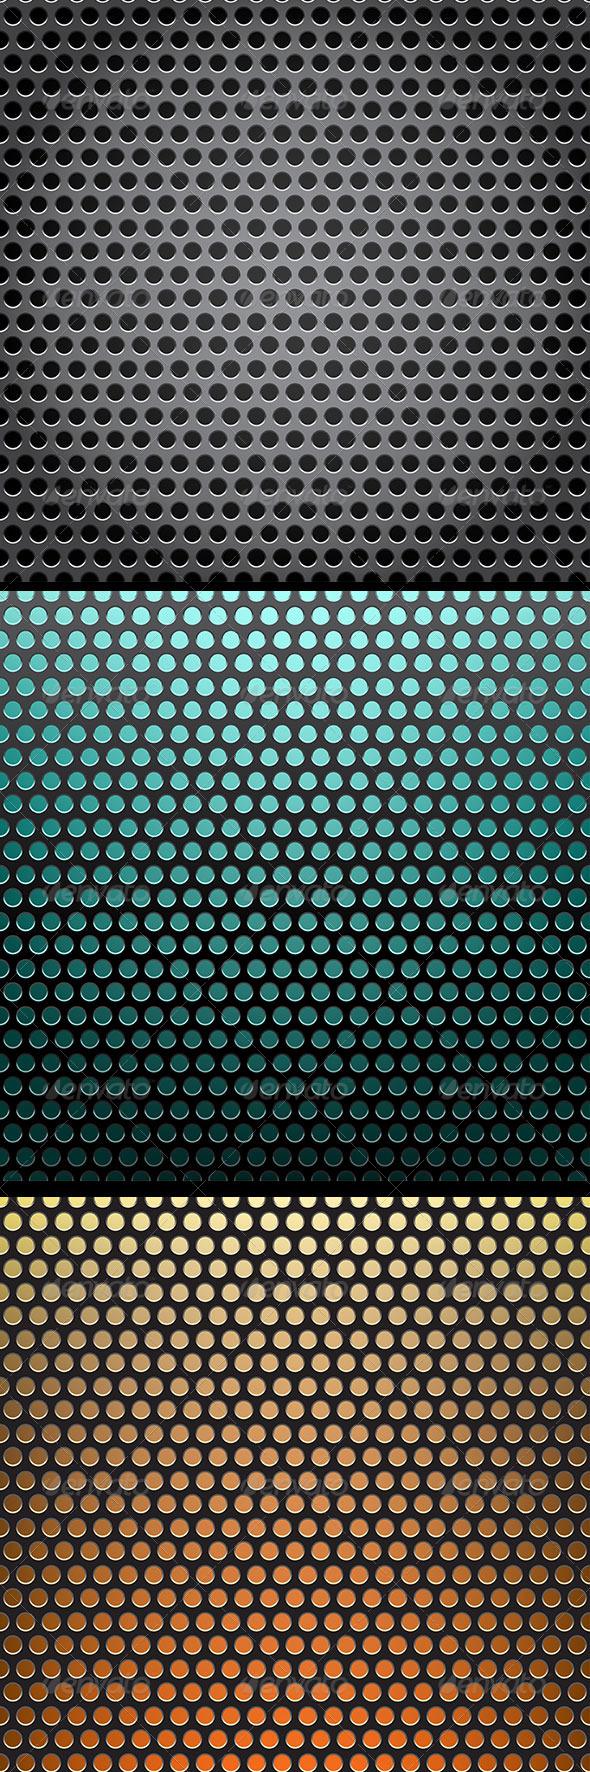 GraphicRiver Metal Grid Background 8269676